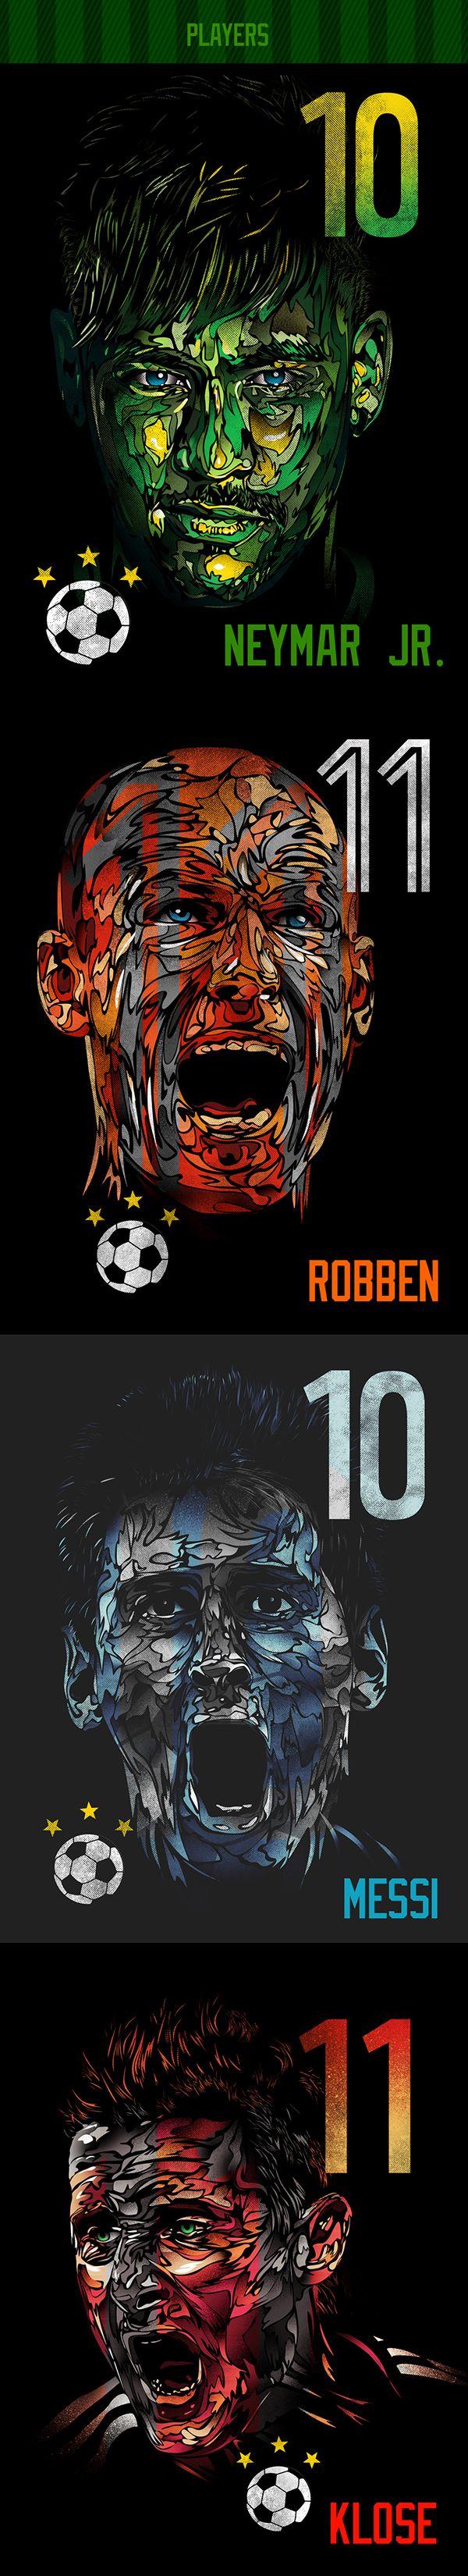 Amazing art work for Neymar and Robben!